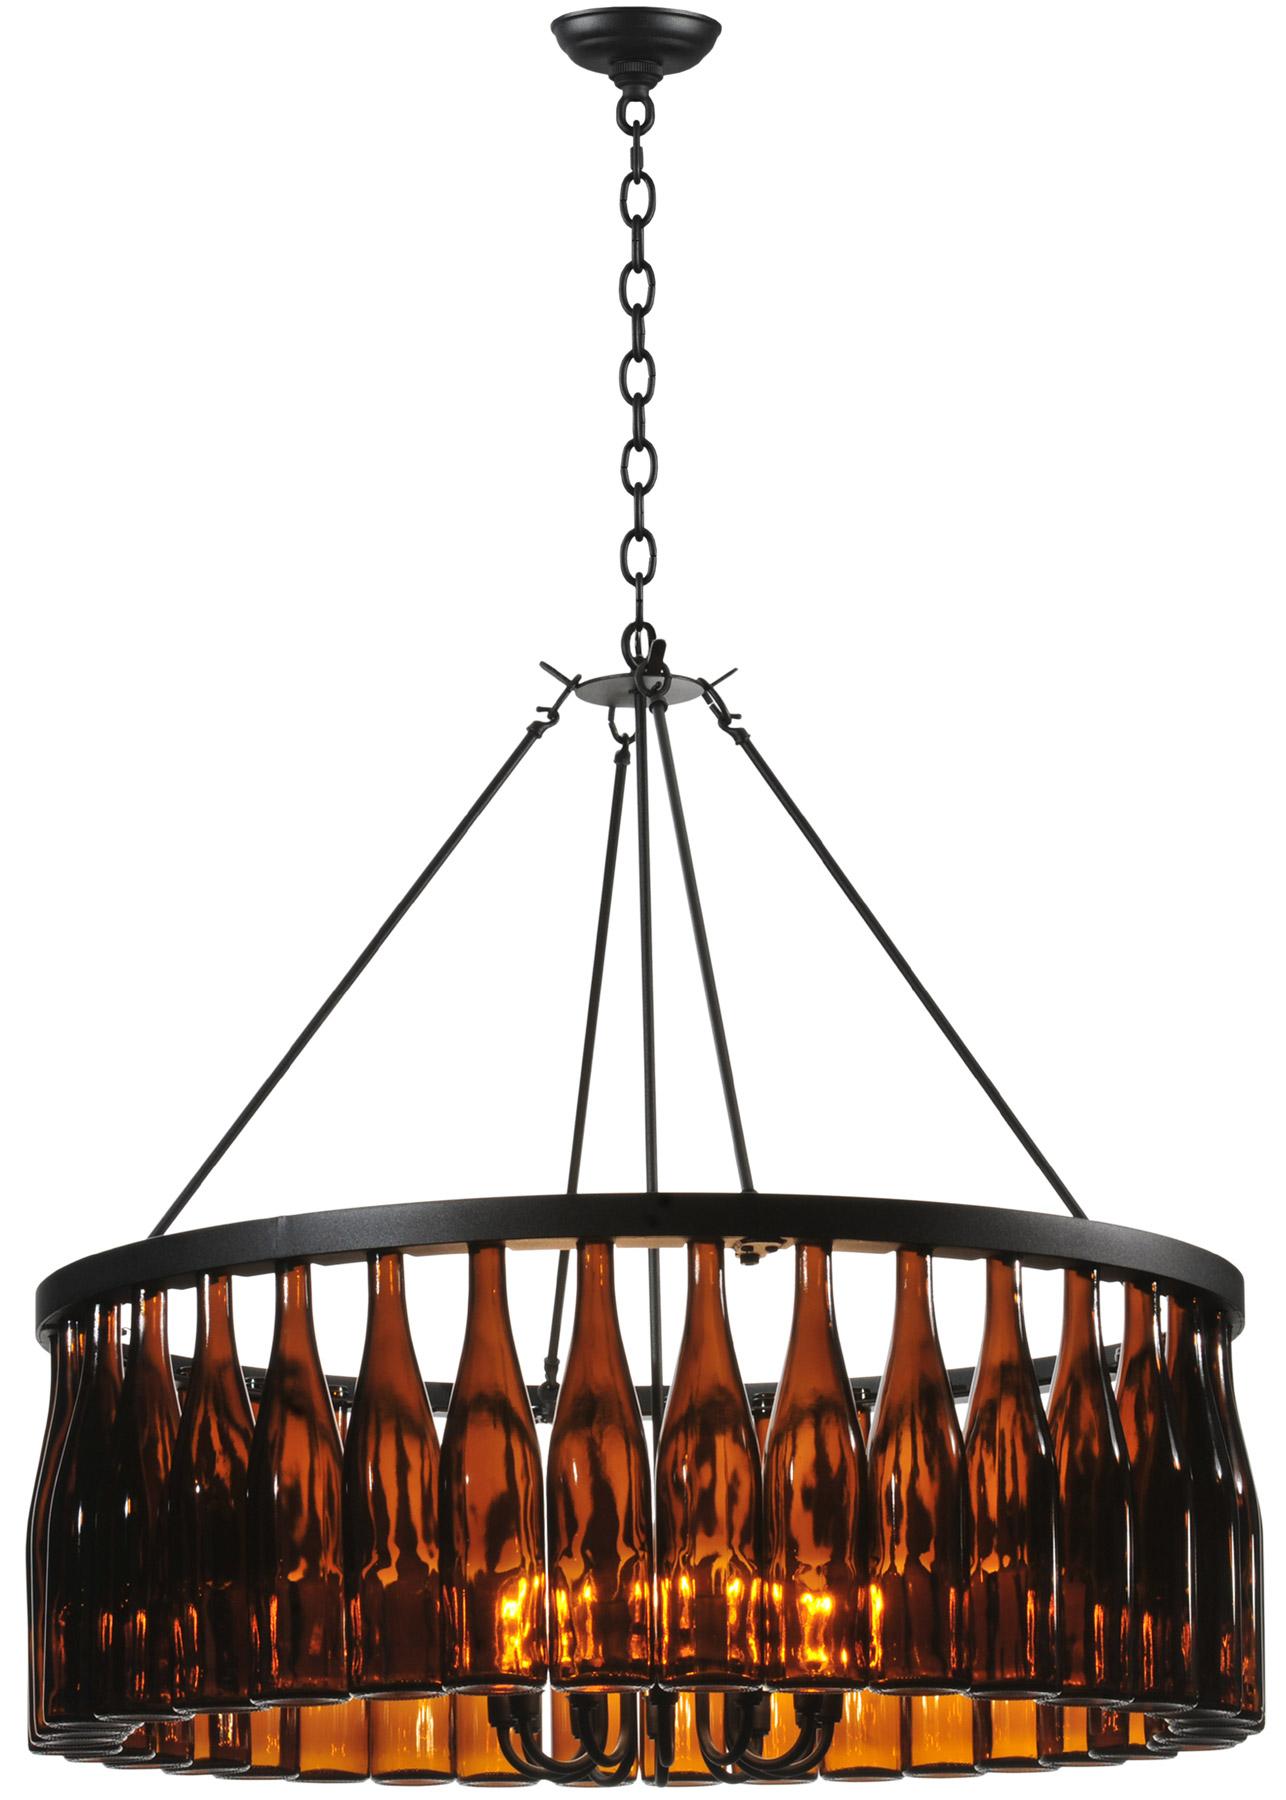 antique chandelier chandeliers dallas tuscan lighting rustic antler italian iron tu cross art tx htm moroccan treasures bronze wrought lodge conrad